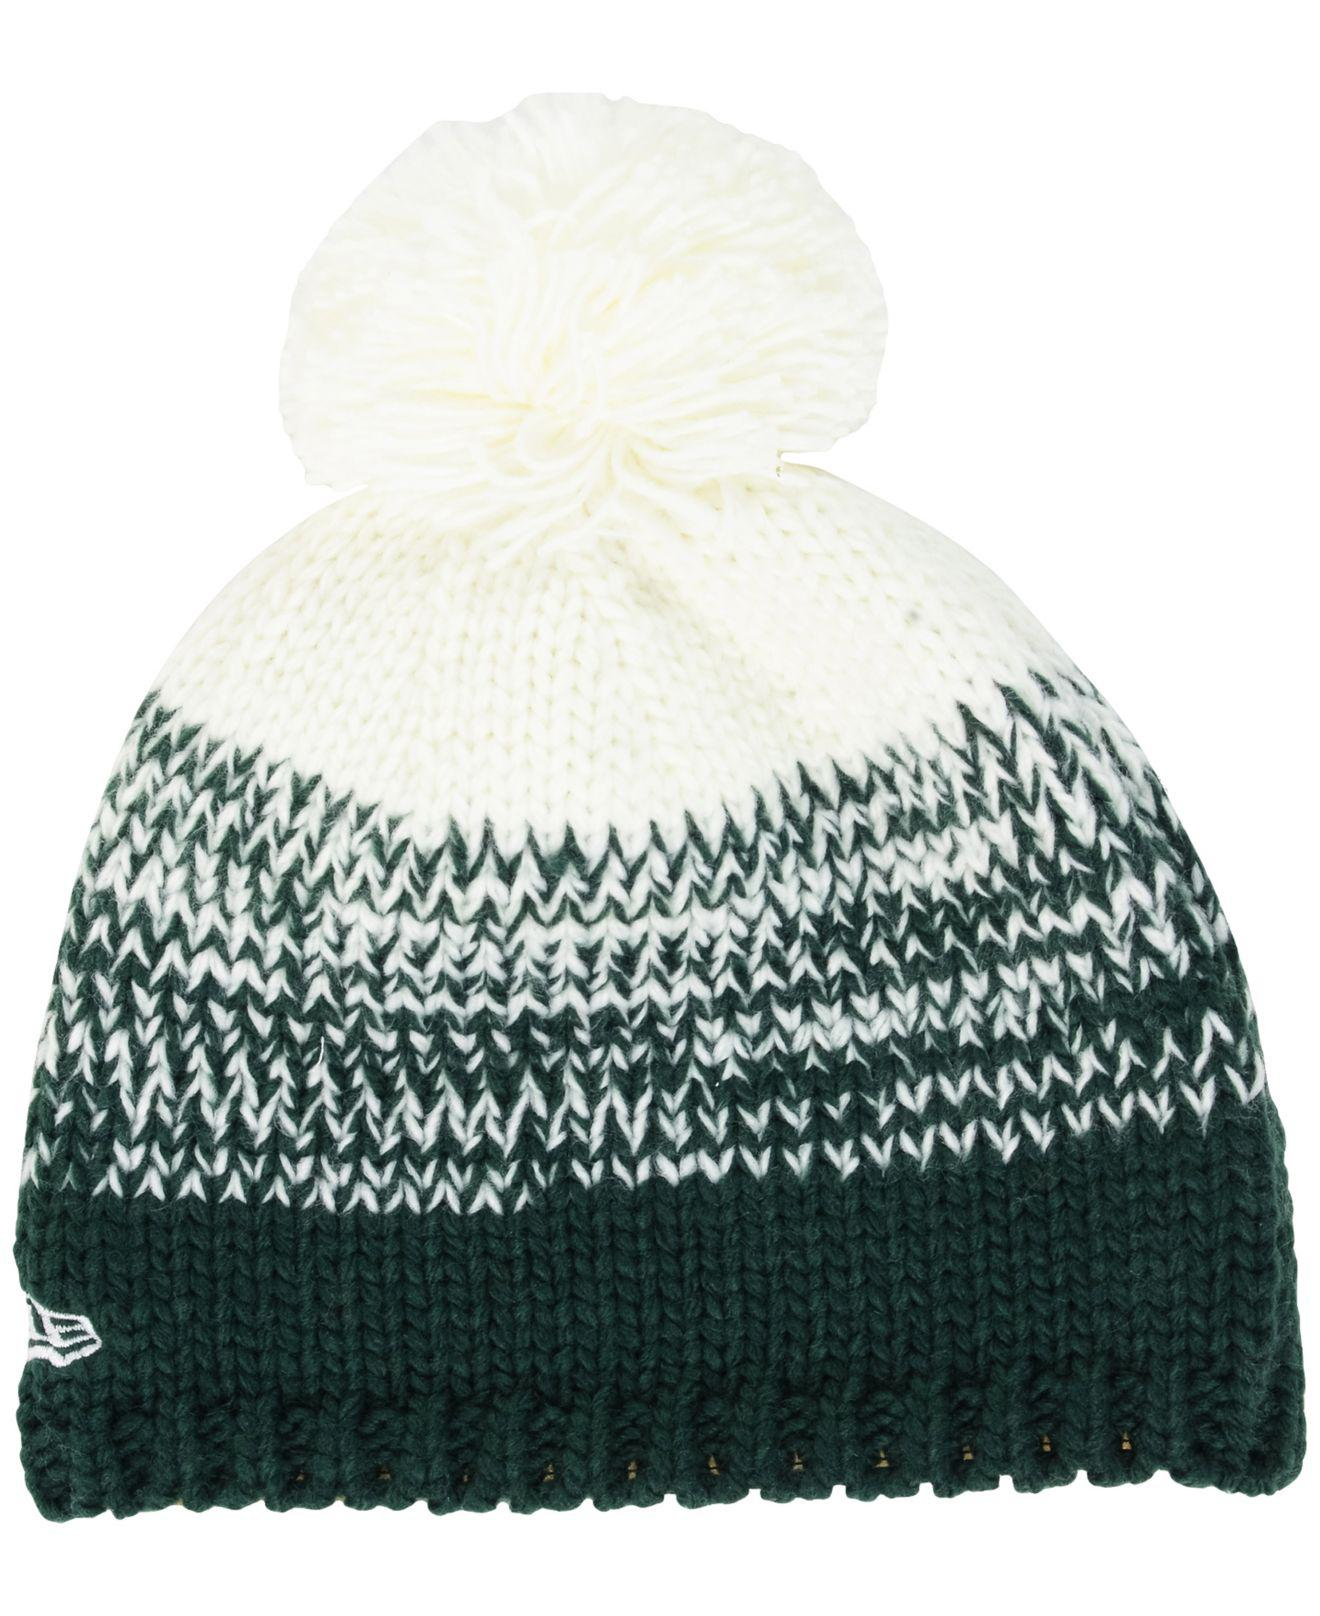 3b5b7d5622603 Lyst - Ktz Women s New York Jets Polar Dust Knit Hat in White